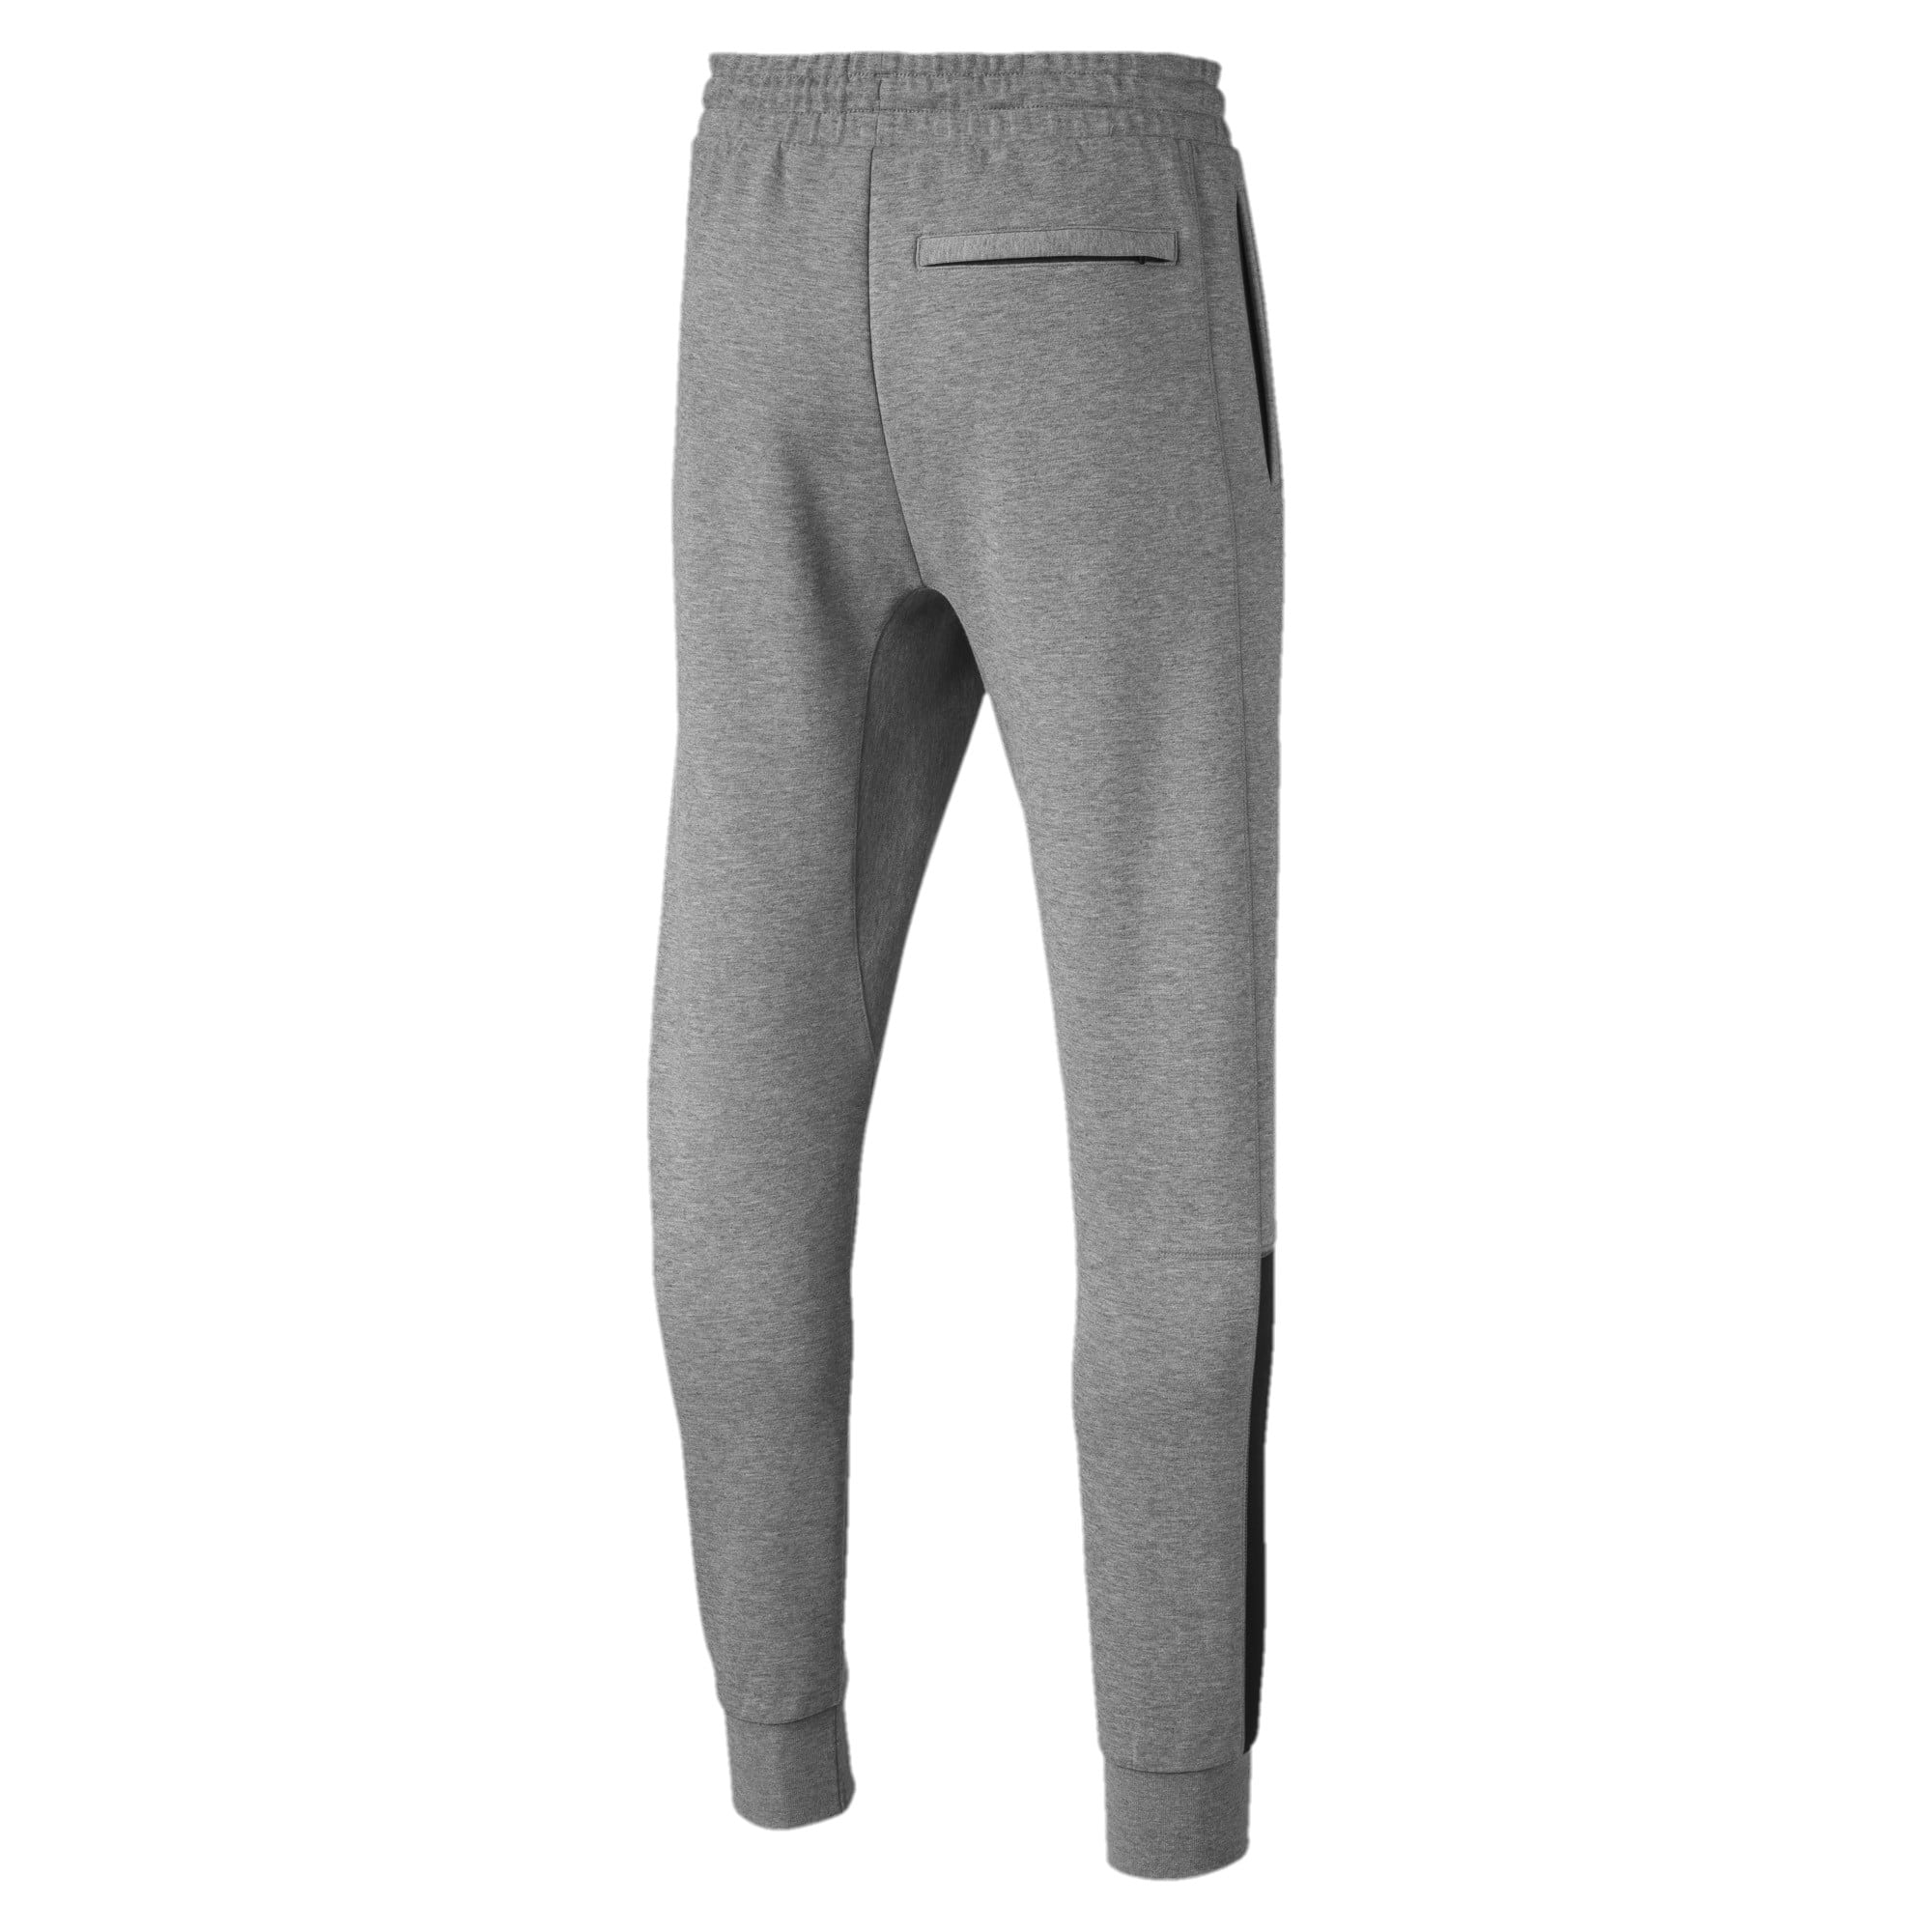 Thumbnail 5 of Epoch Knitted broek voor heren, Medium Gray Heather, medium